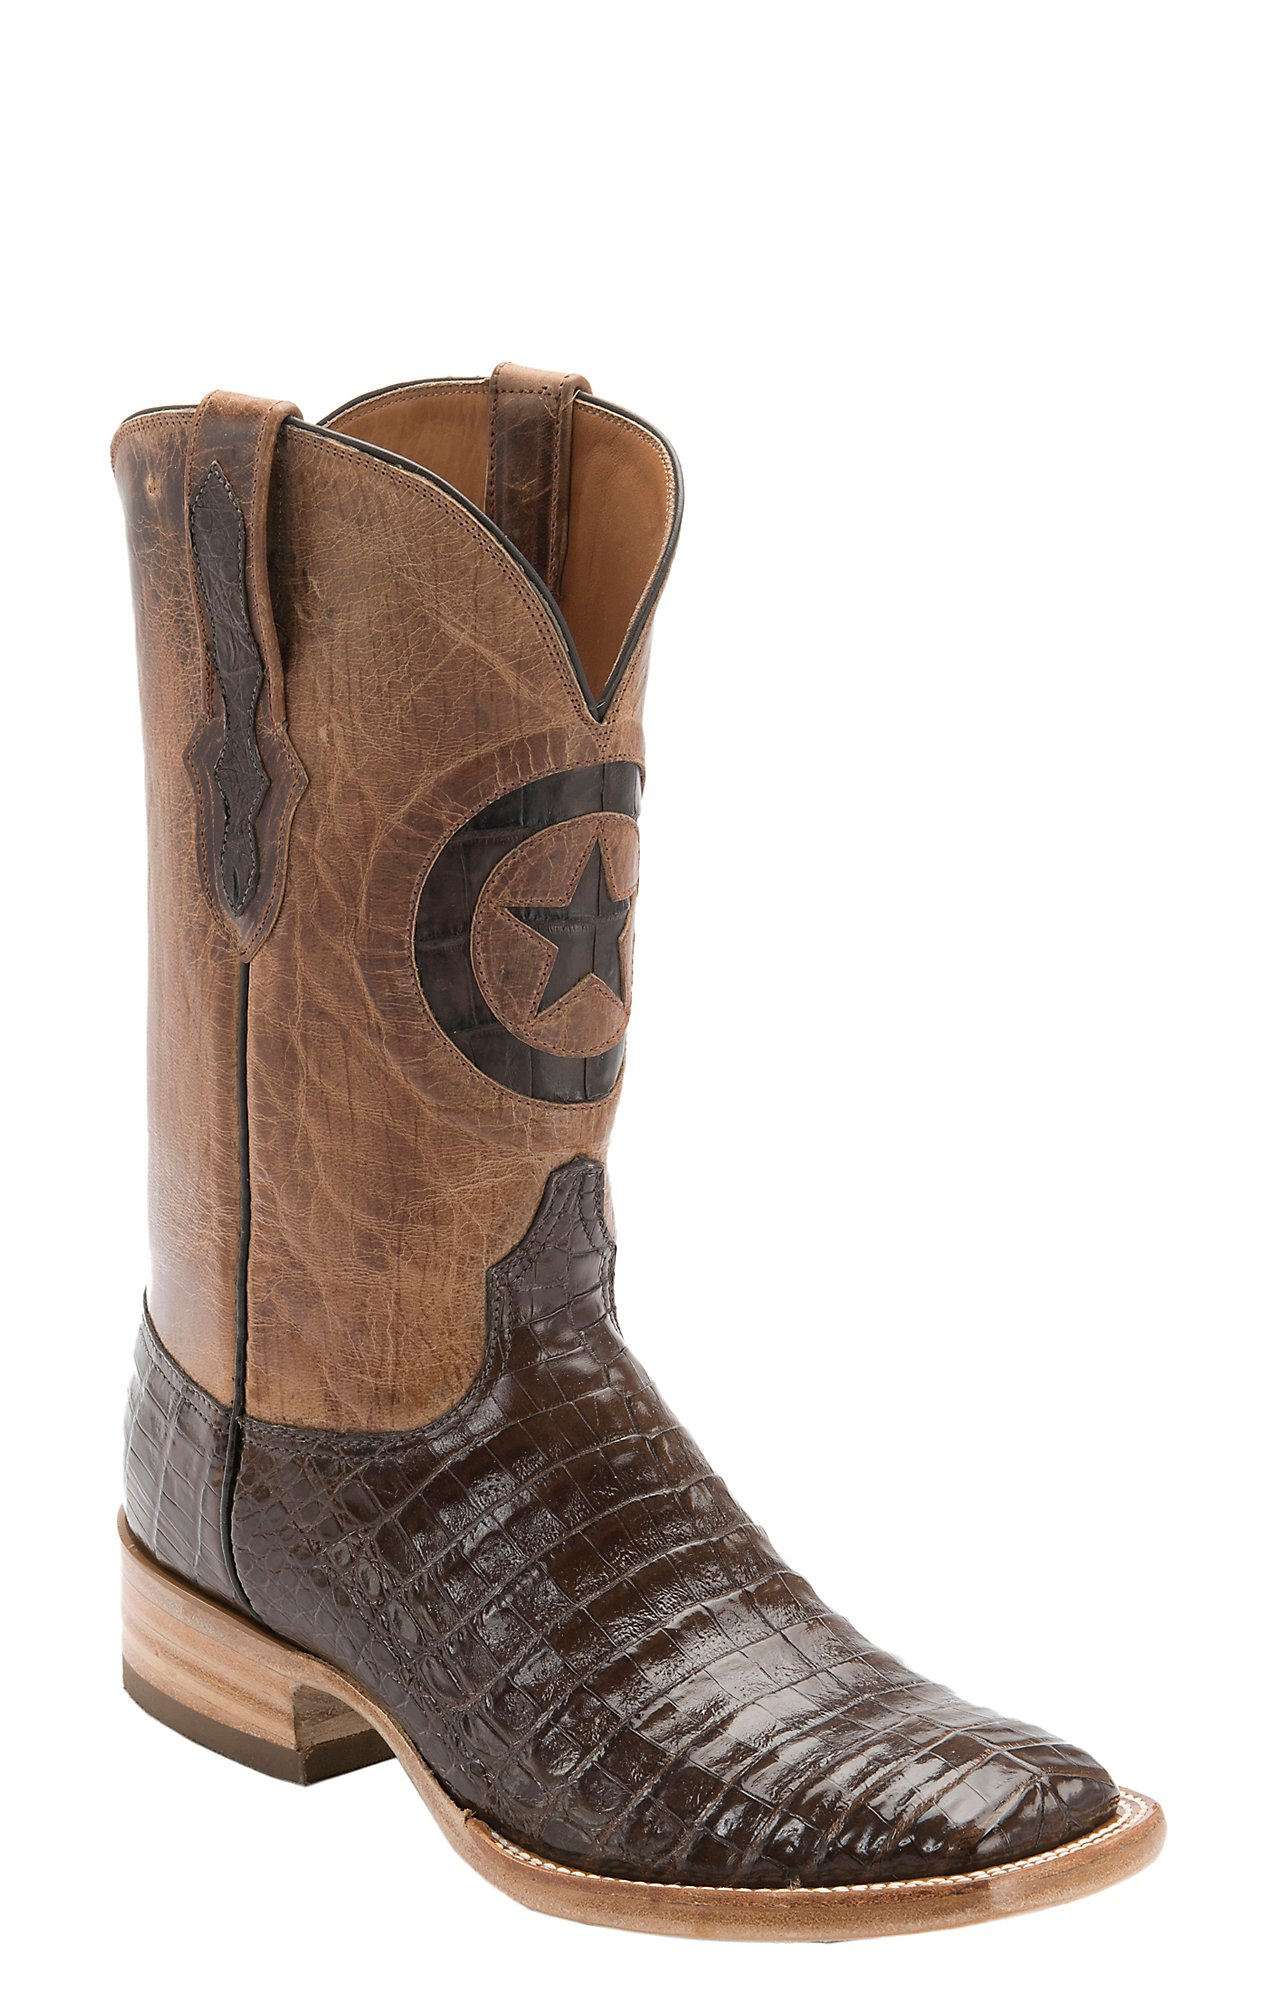 Gator Skin Boots Square Toe Square Toe Western Boots